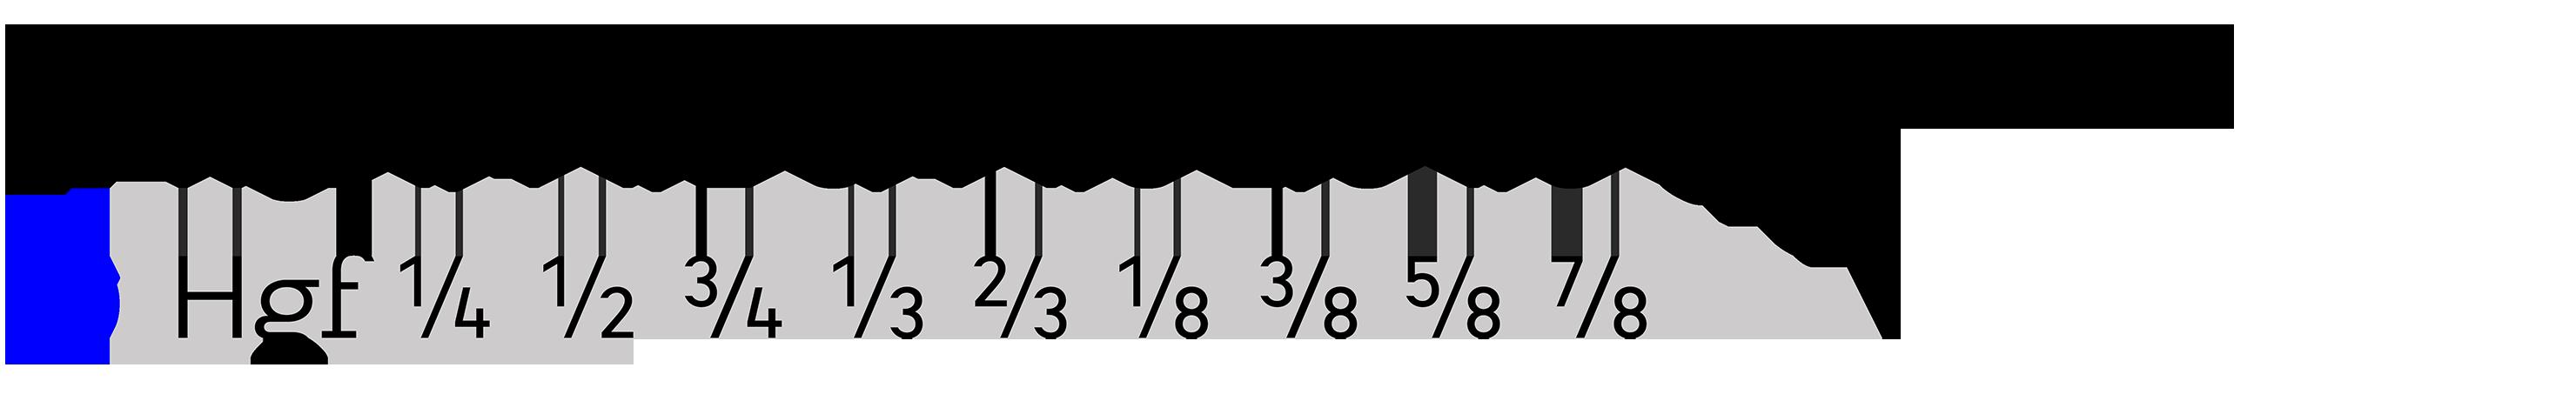 Typeface-Heimat-Sans-F11-Atlas-Font-Foundry